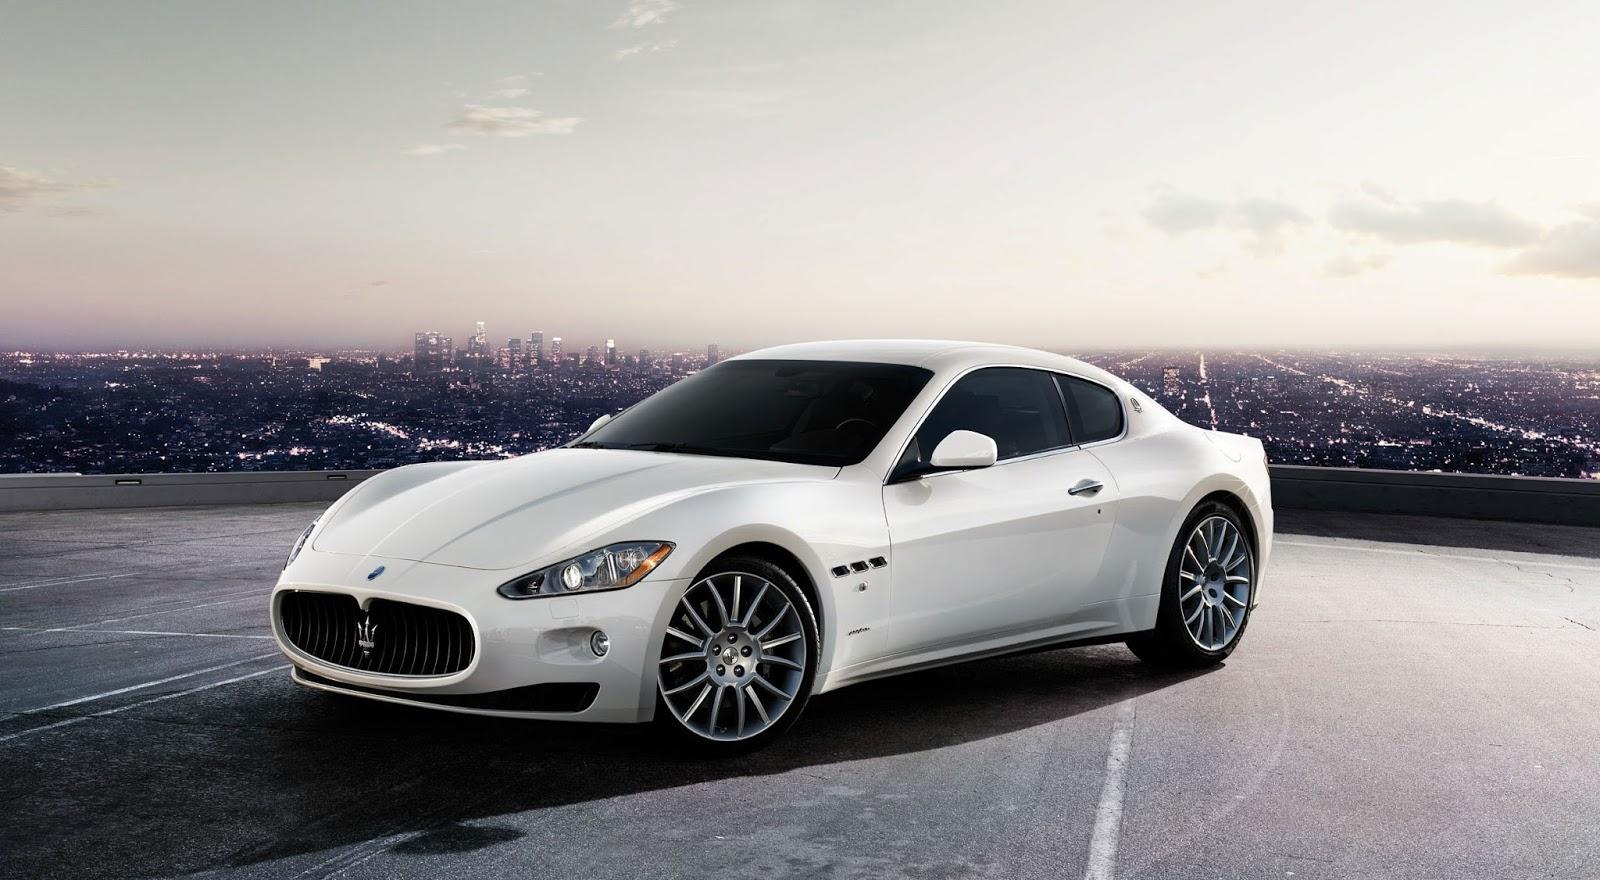 luxury car brands maserati  Maserati Luxury Car Brands Review | Luxury Car Brands Review Blog